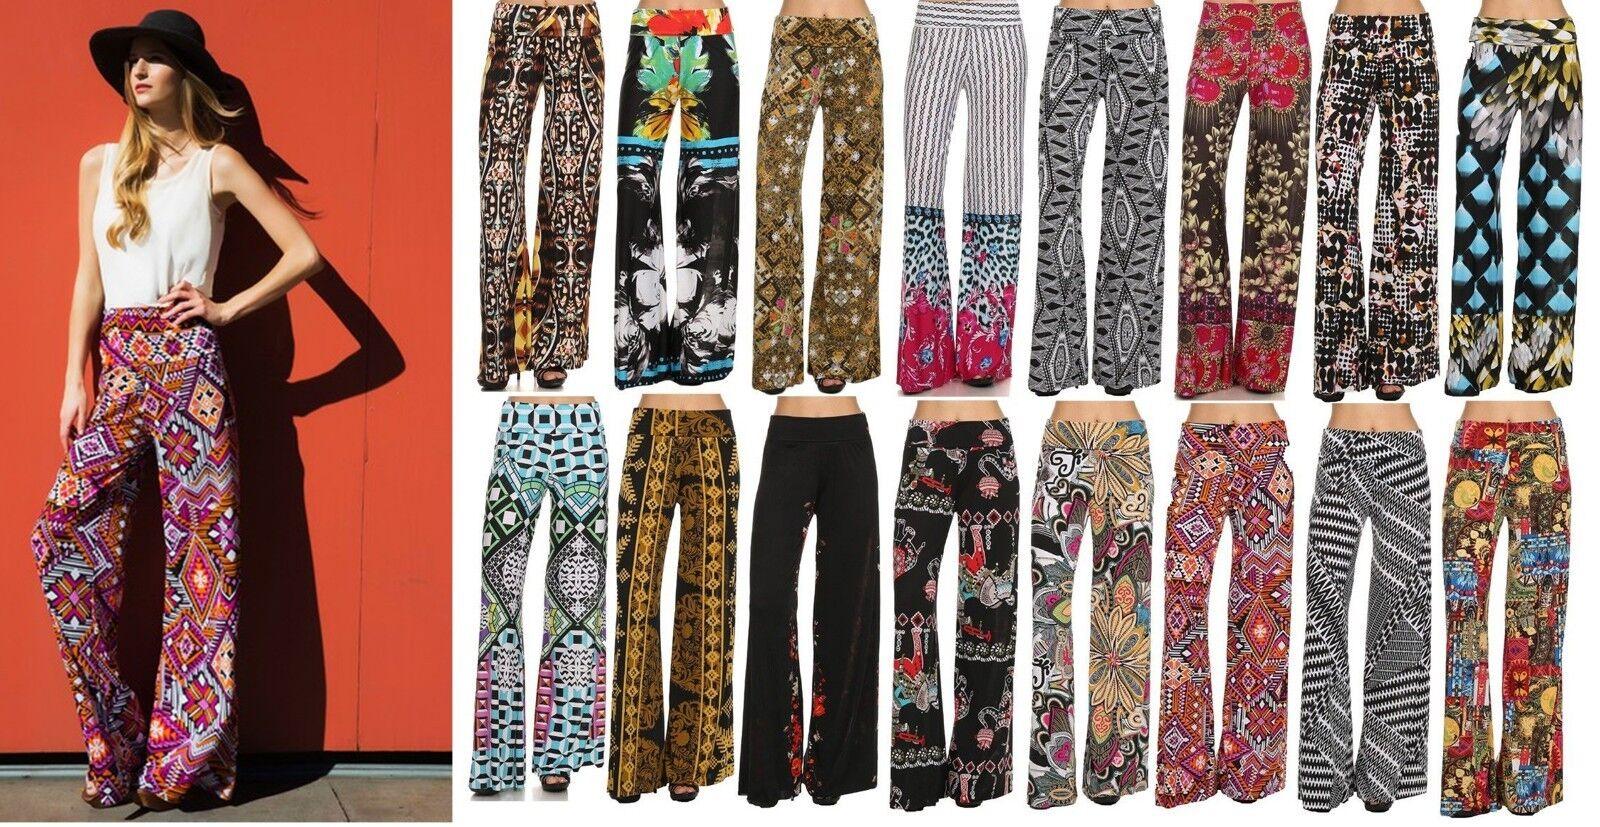 Bdcoco Womens High Fold Over Waist Wide Leg Boho Print Palazzo Pants Plus Size